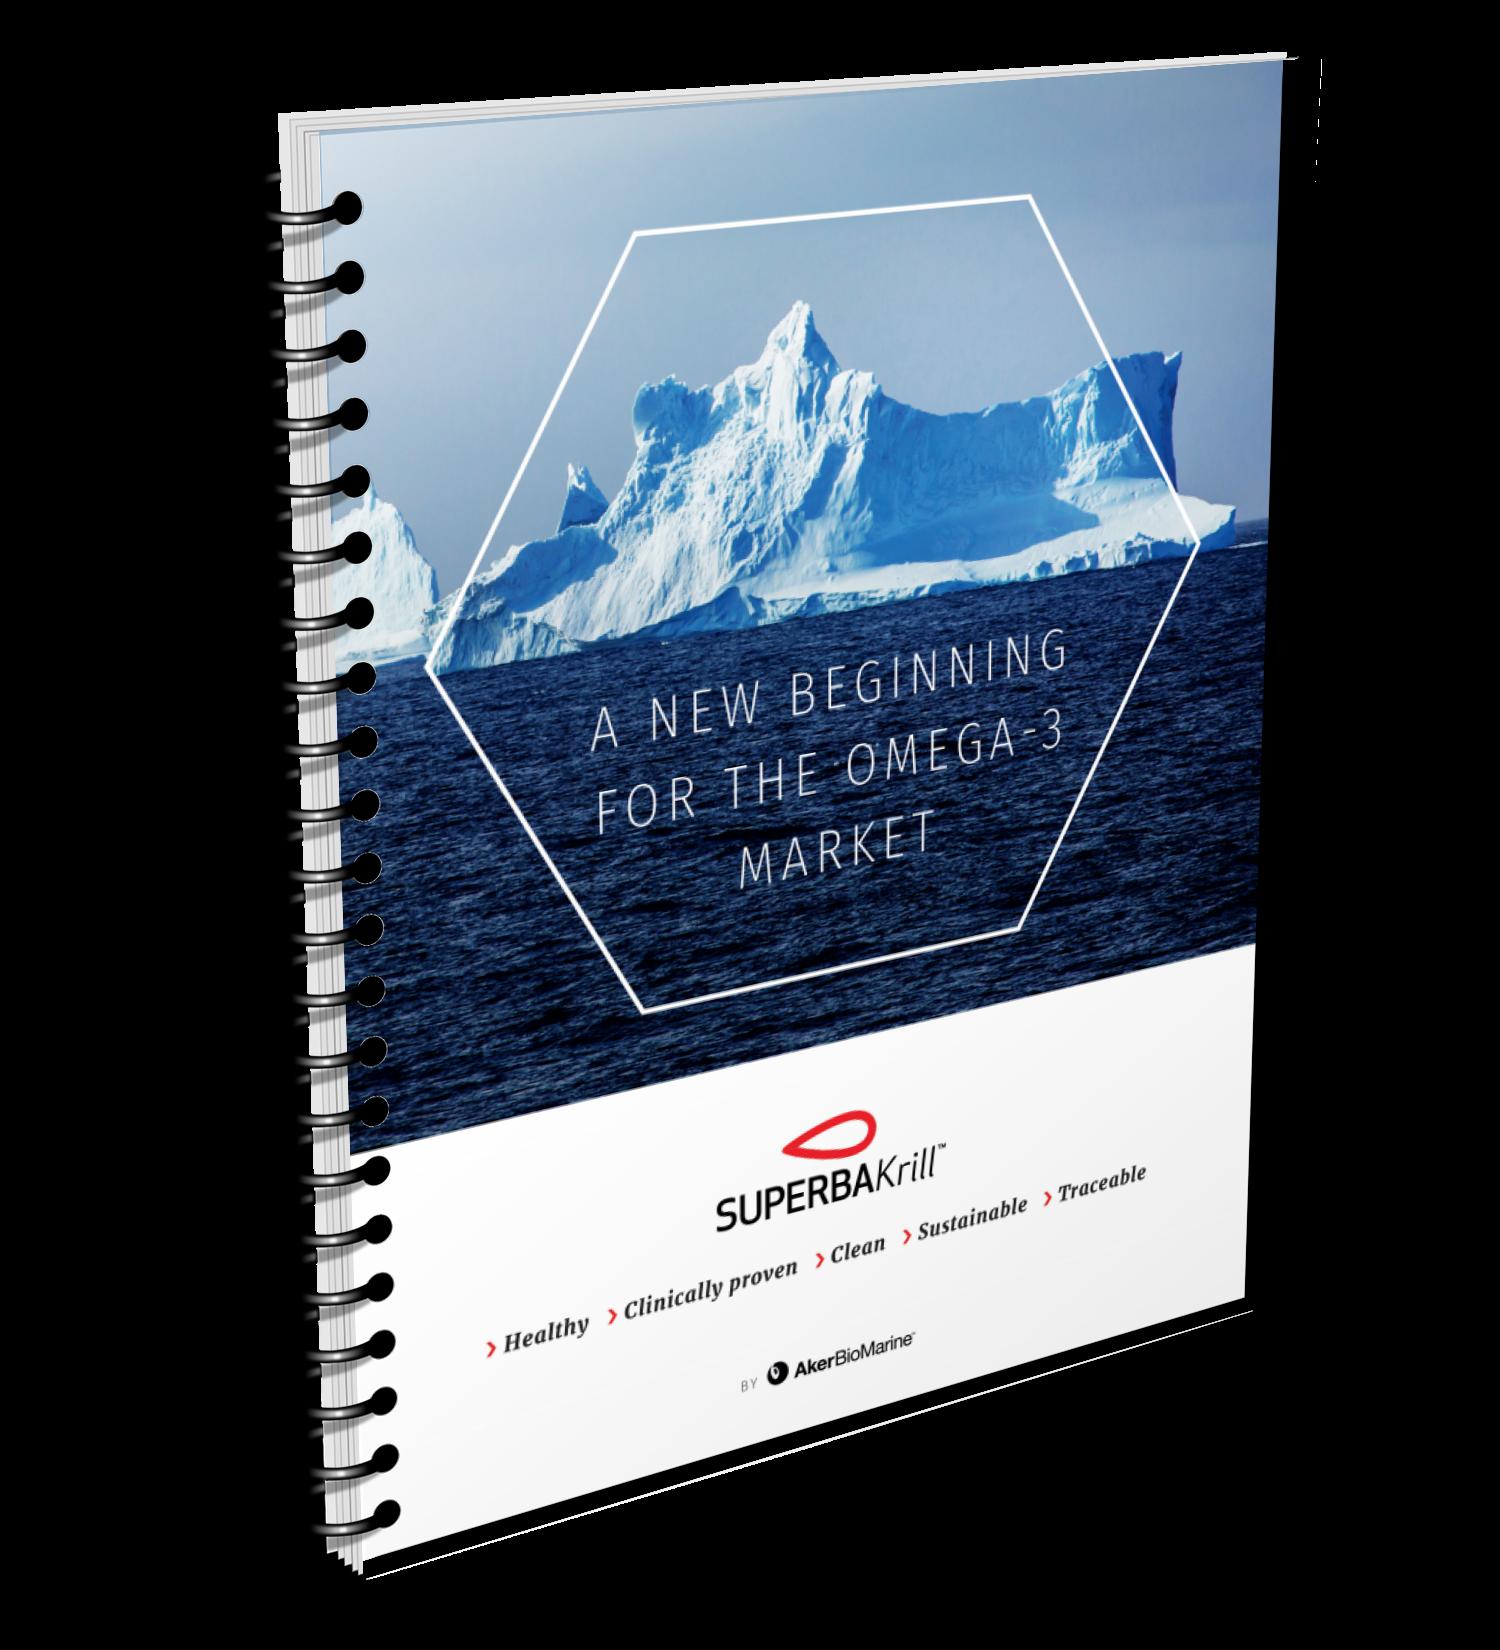 Superba-krill-brochure-book-cta